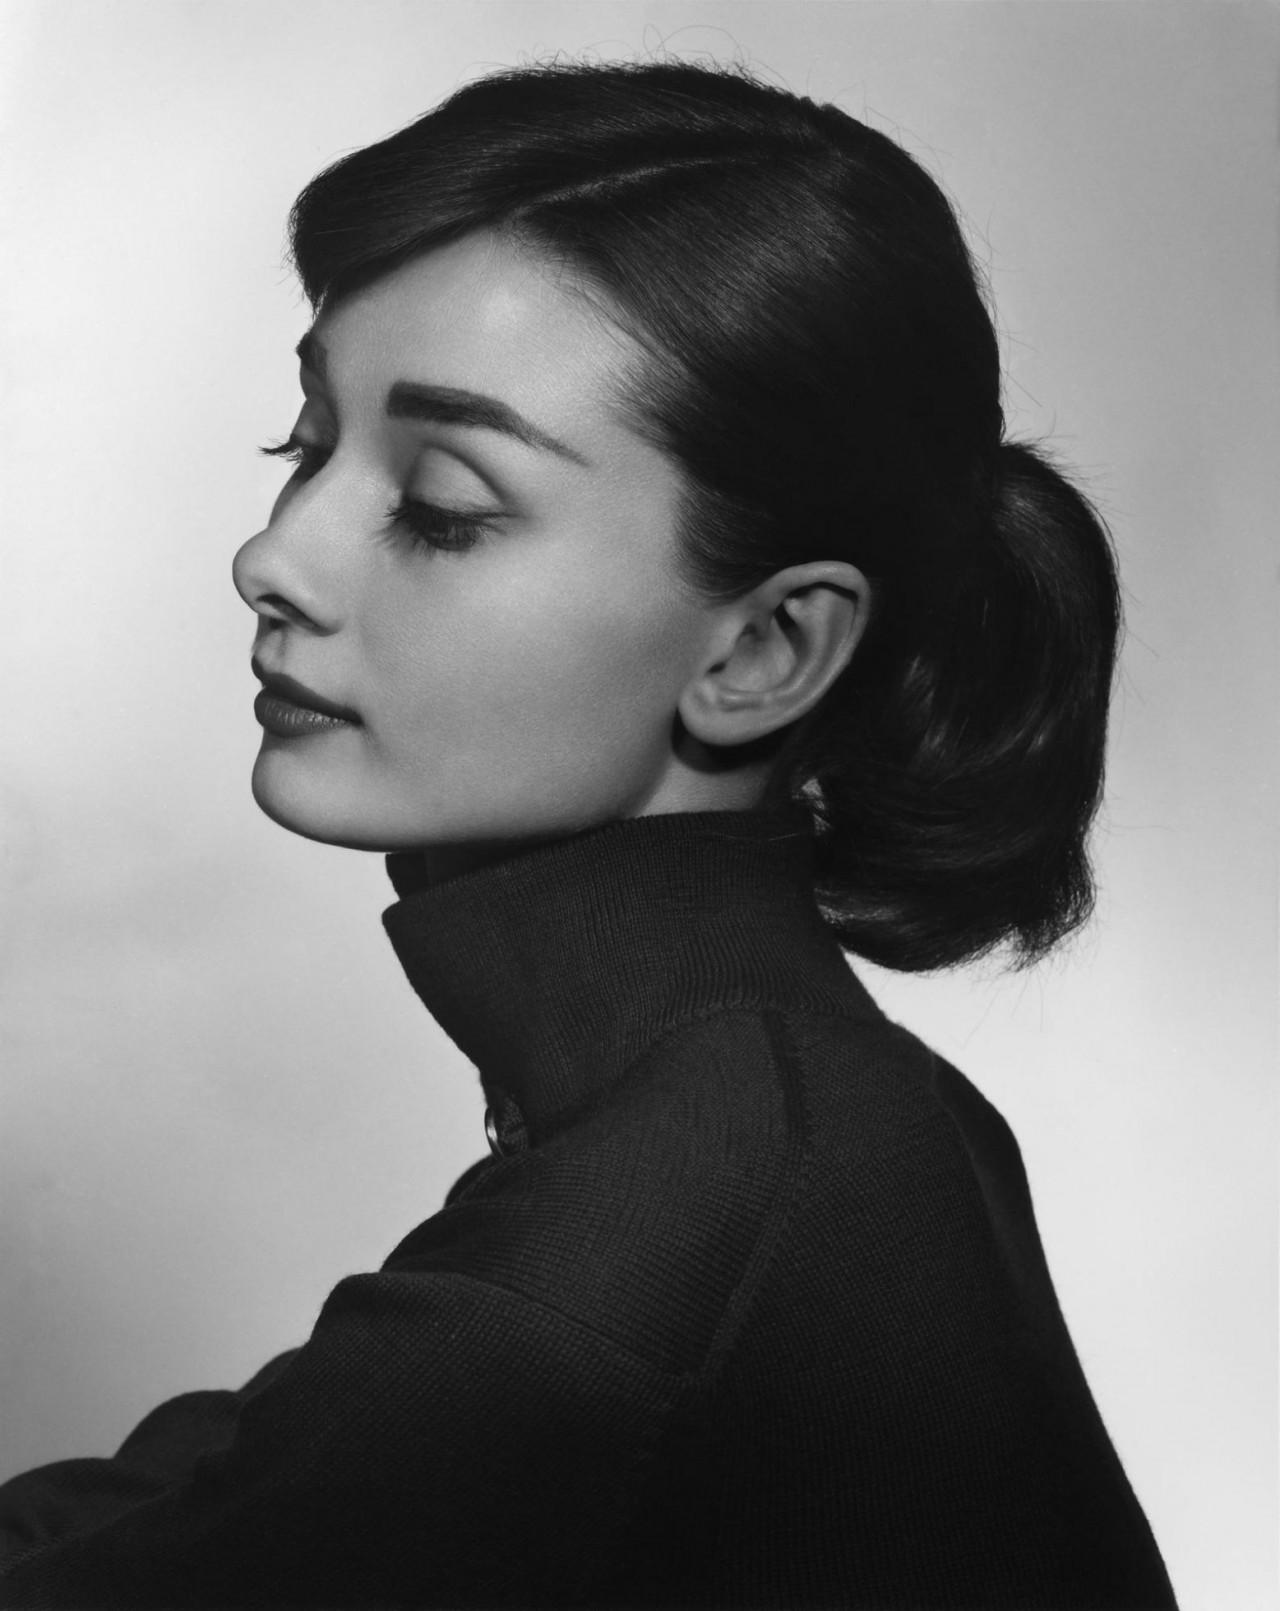 Одри Хепбёрн, 1956. Автор Юсуф Карш